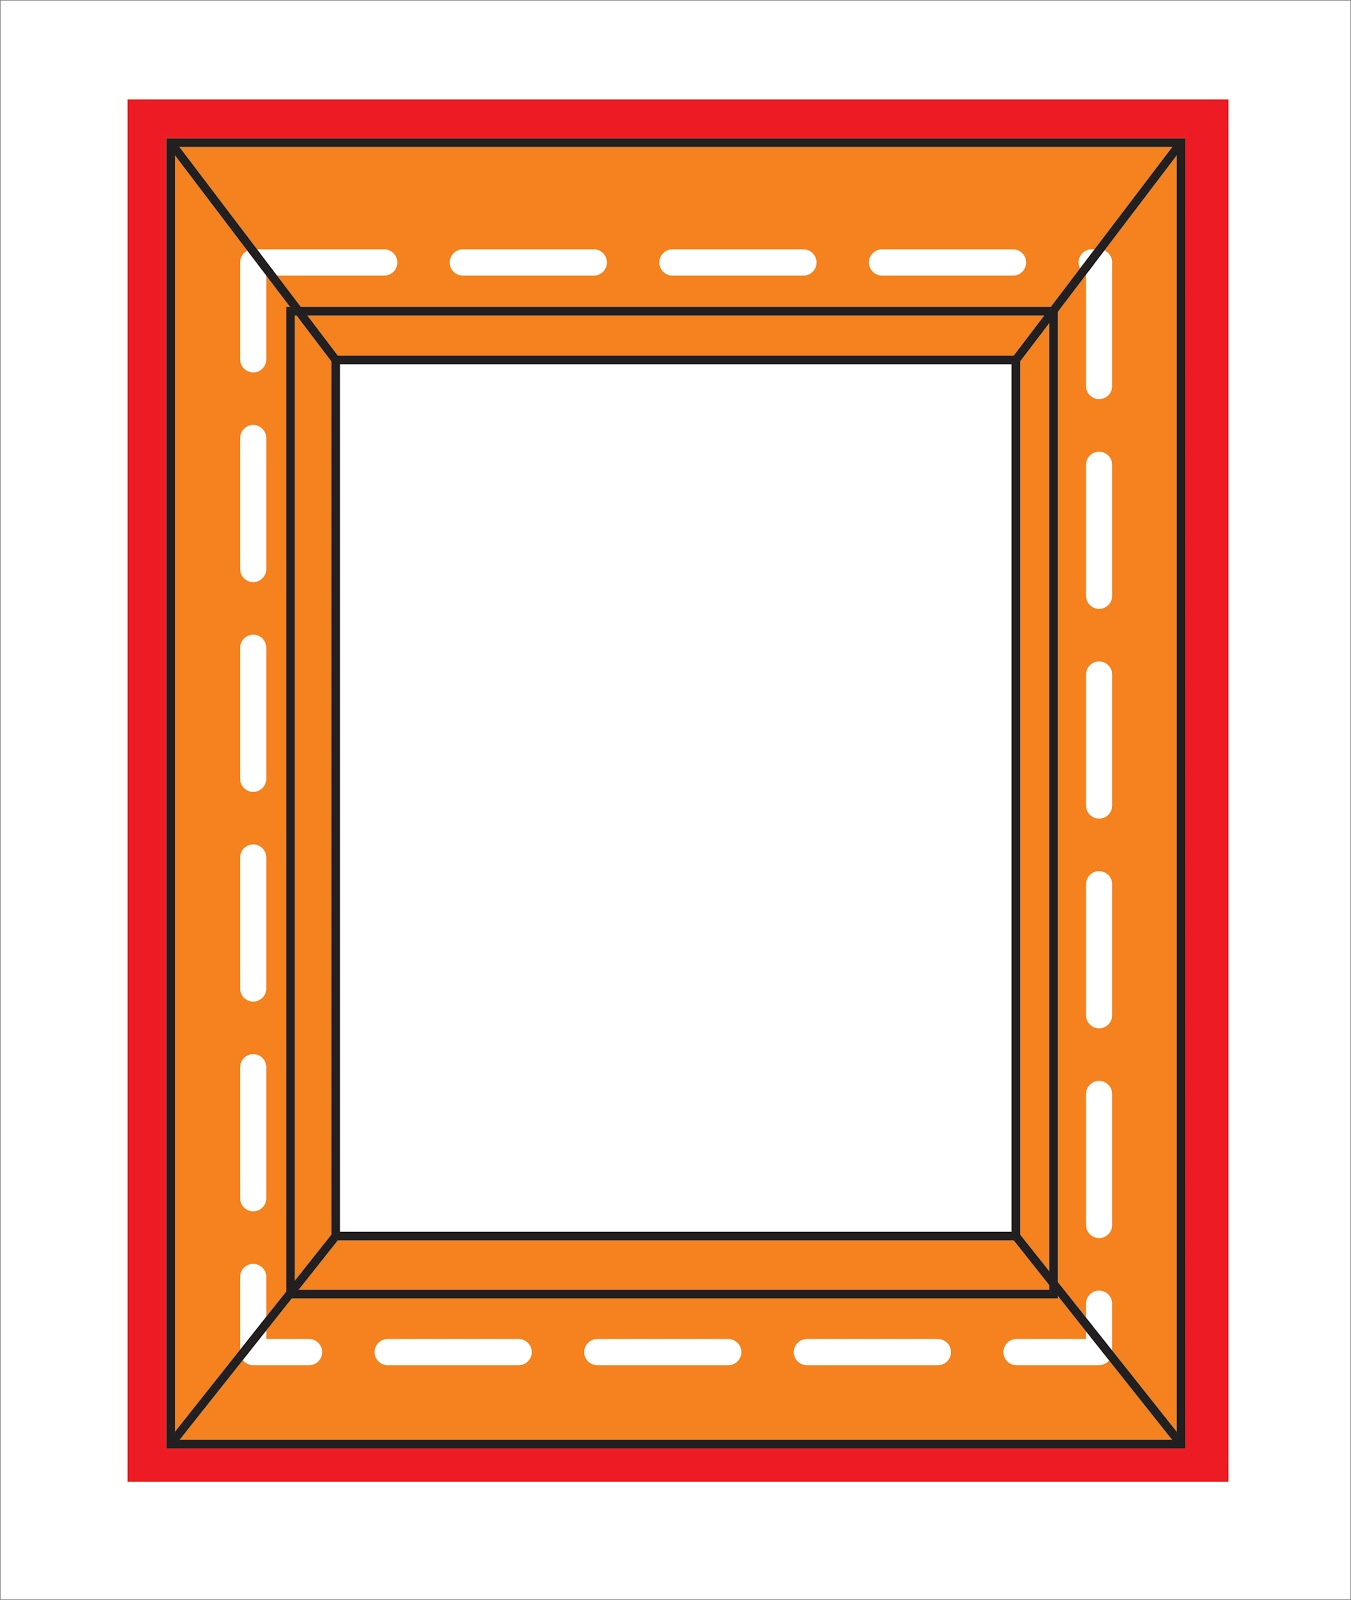 Pigura | New Calendar Template Site